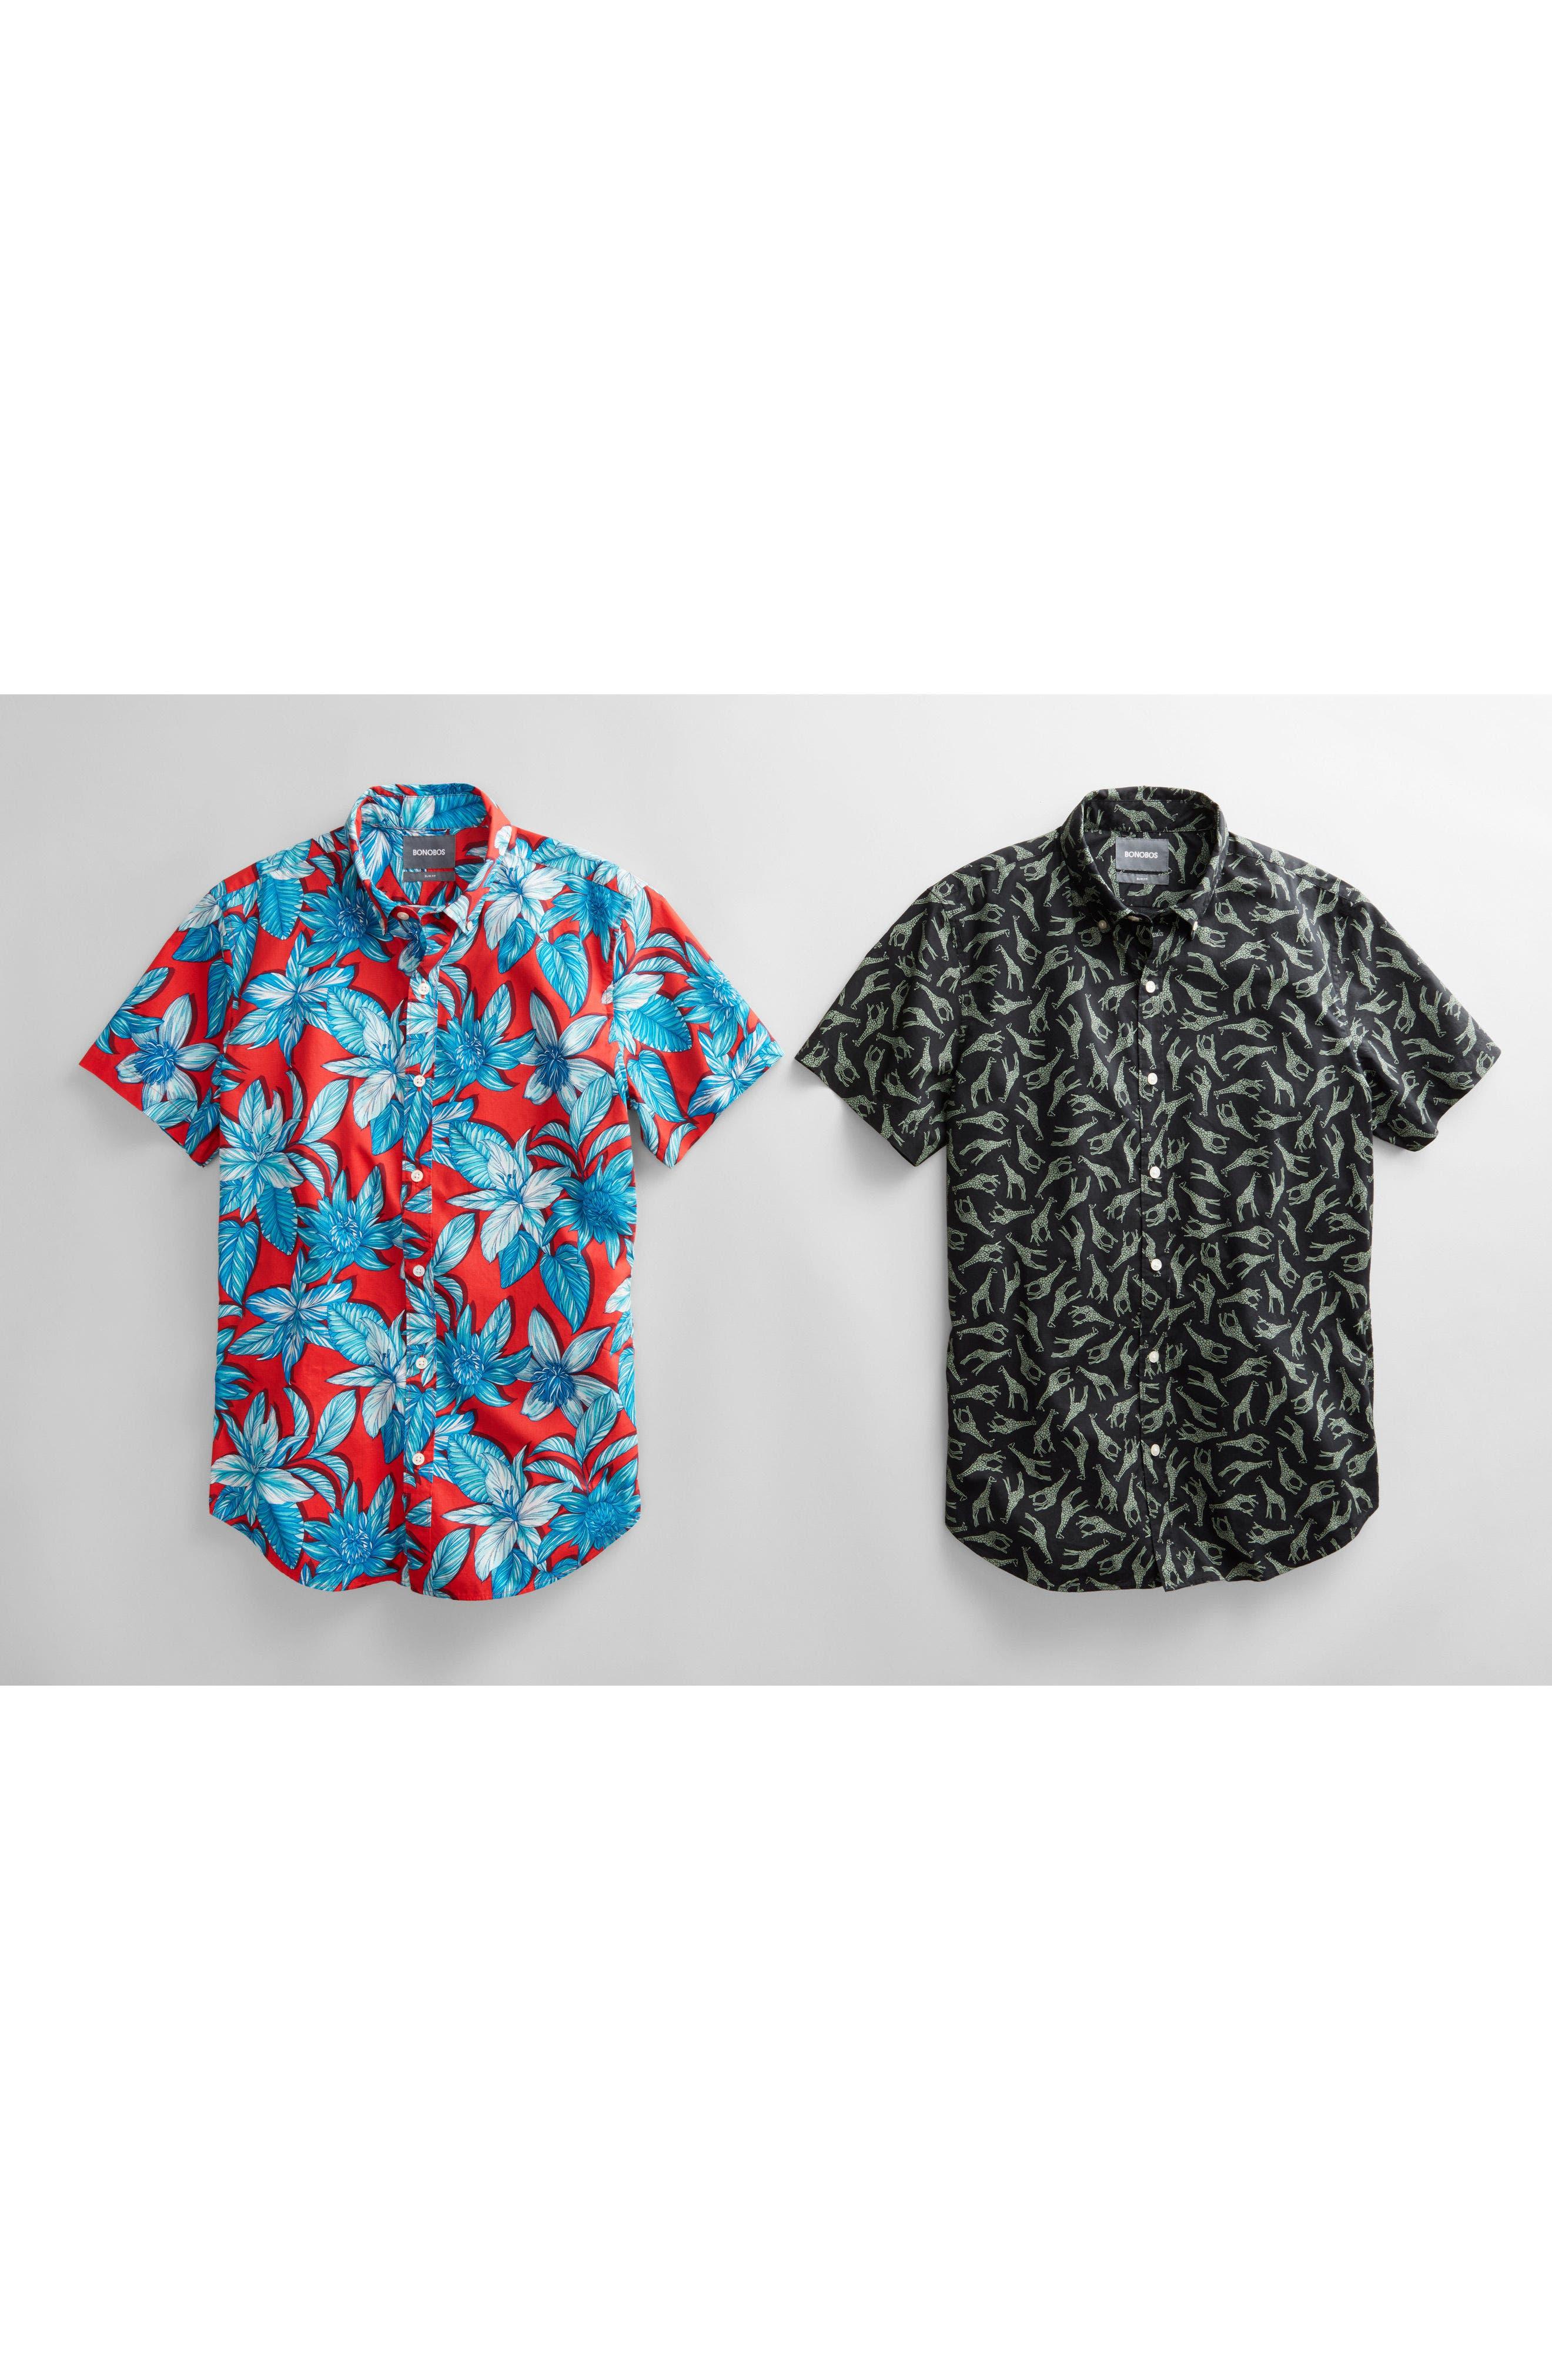 BONOBOS,                             Riviera Slim Fit Giraffe Print Sport Shirt,                             Alternate thumbnail 8, color,                             001